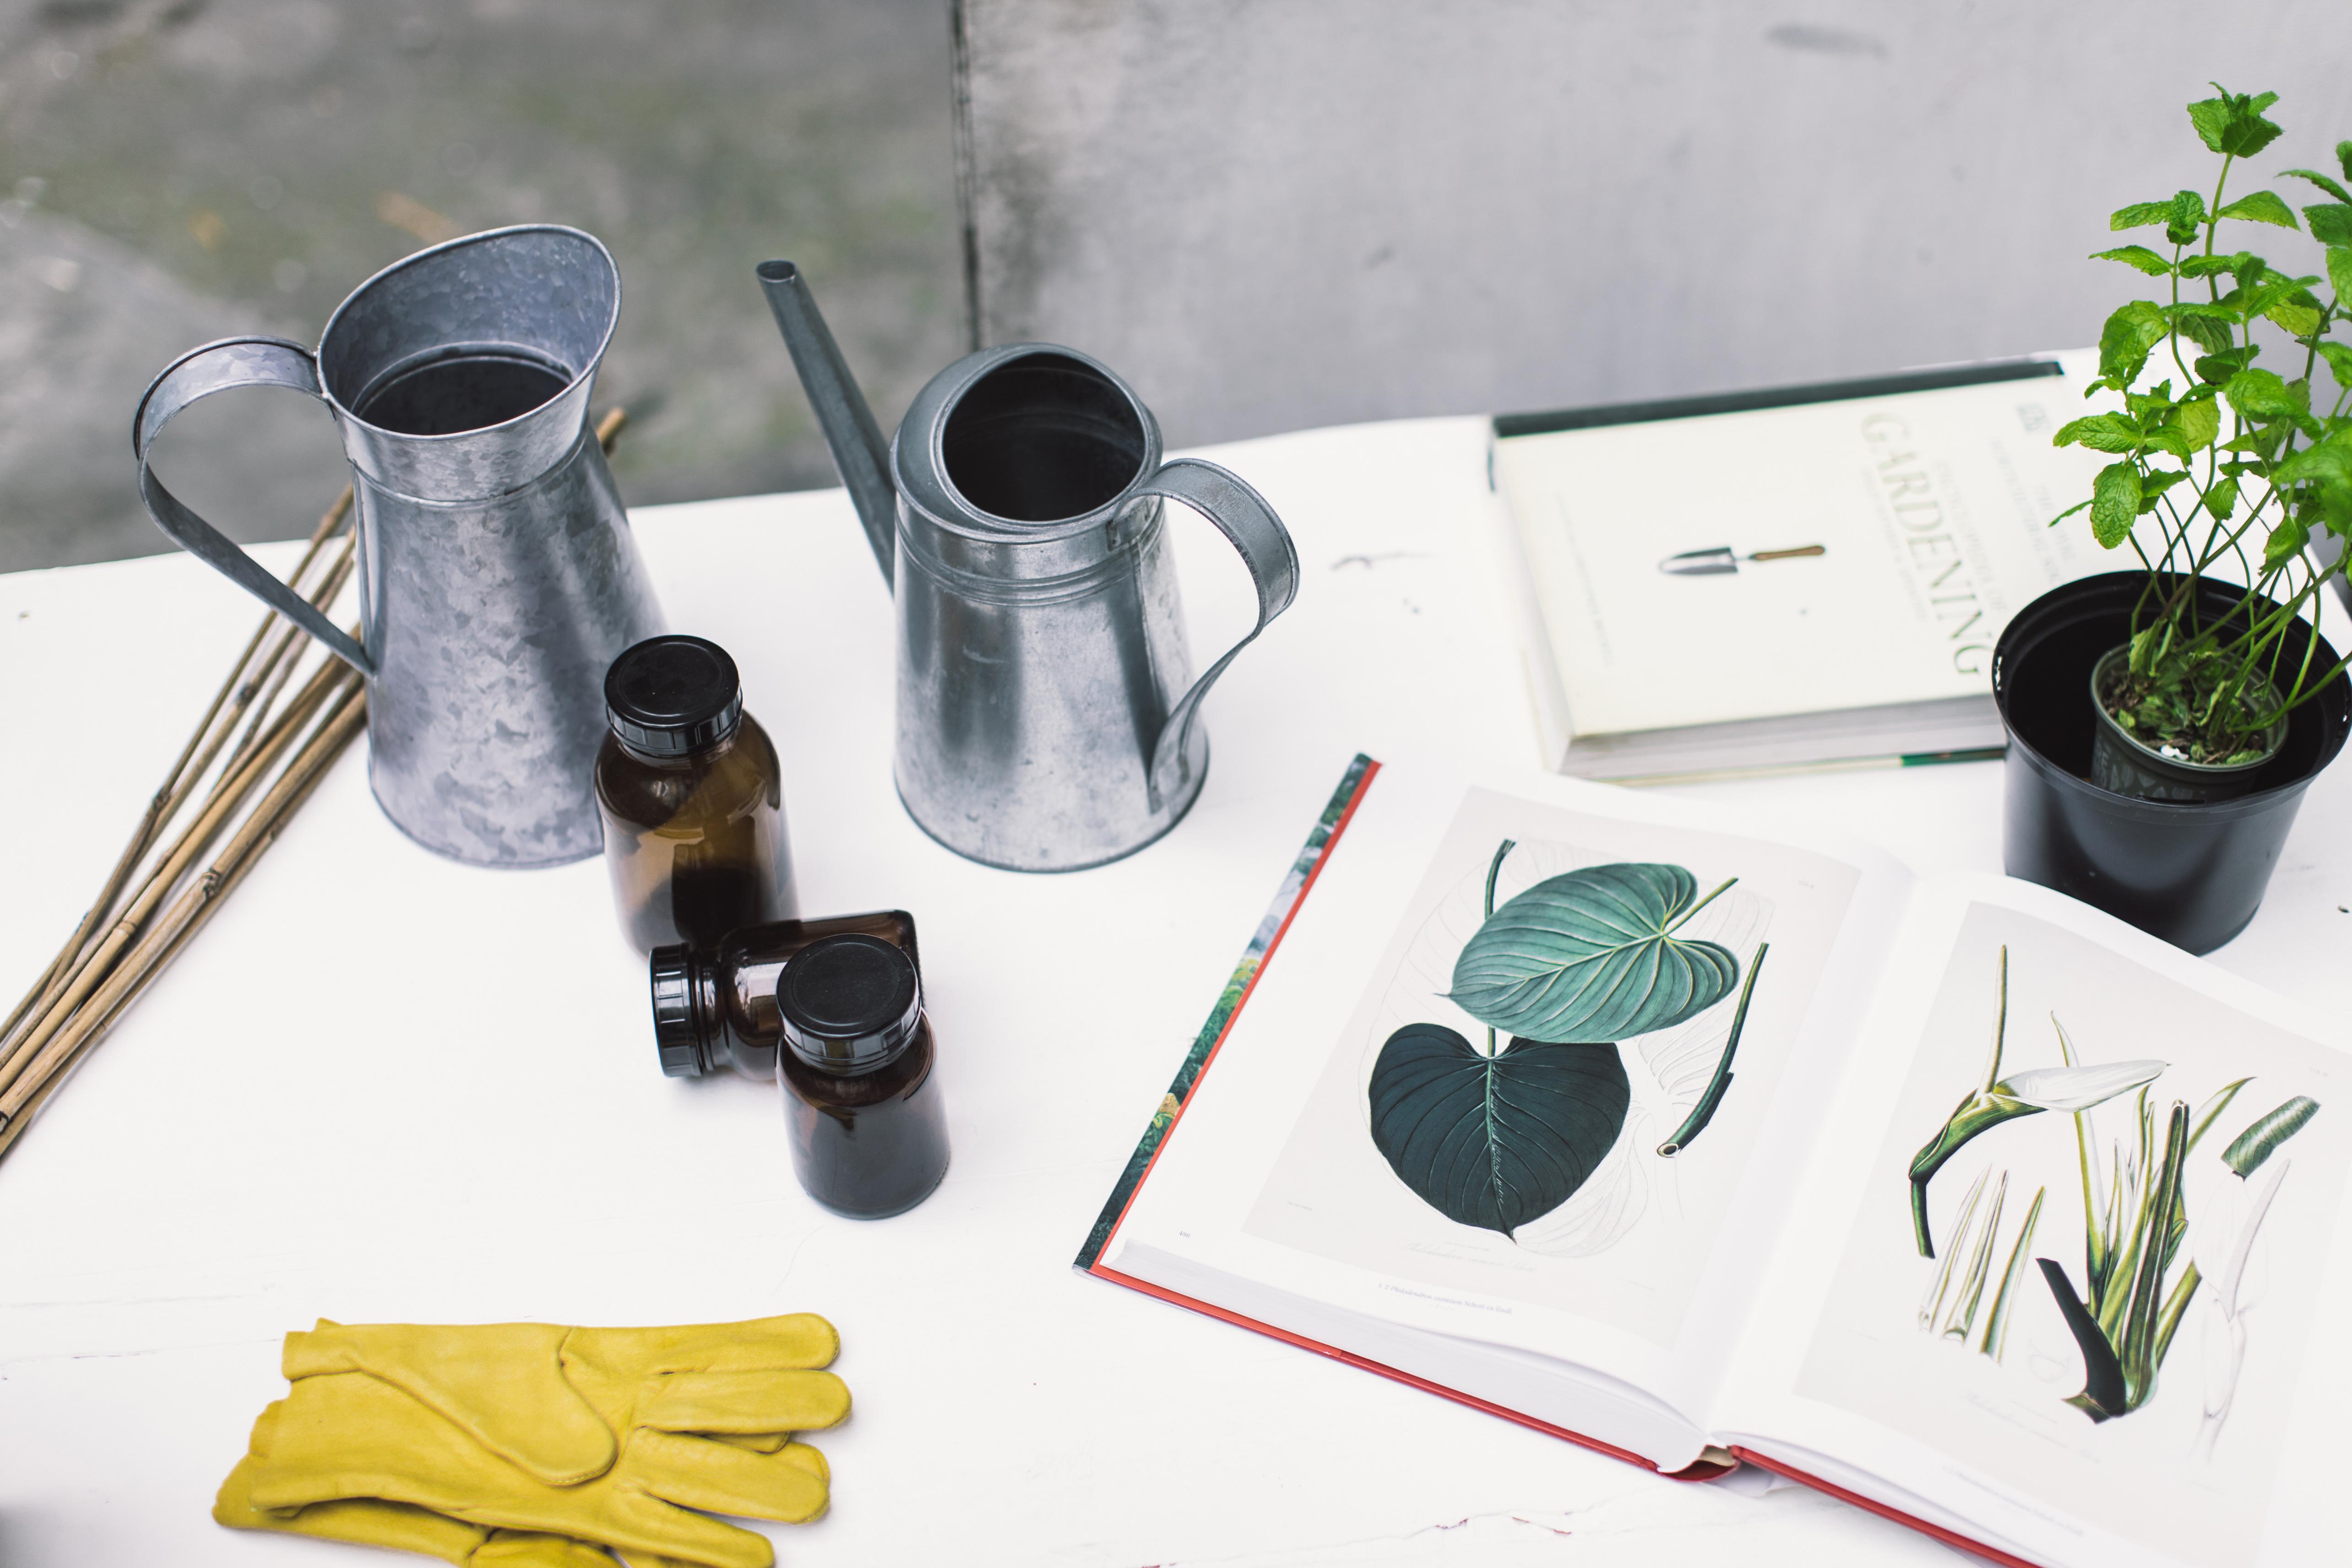 gardening items